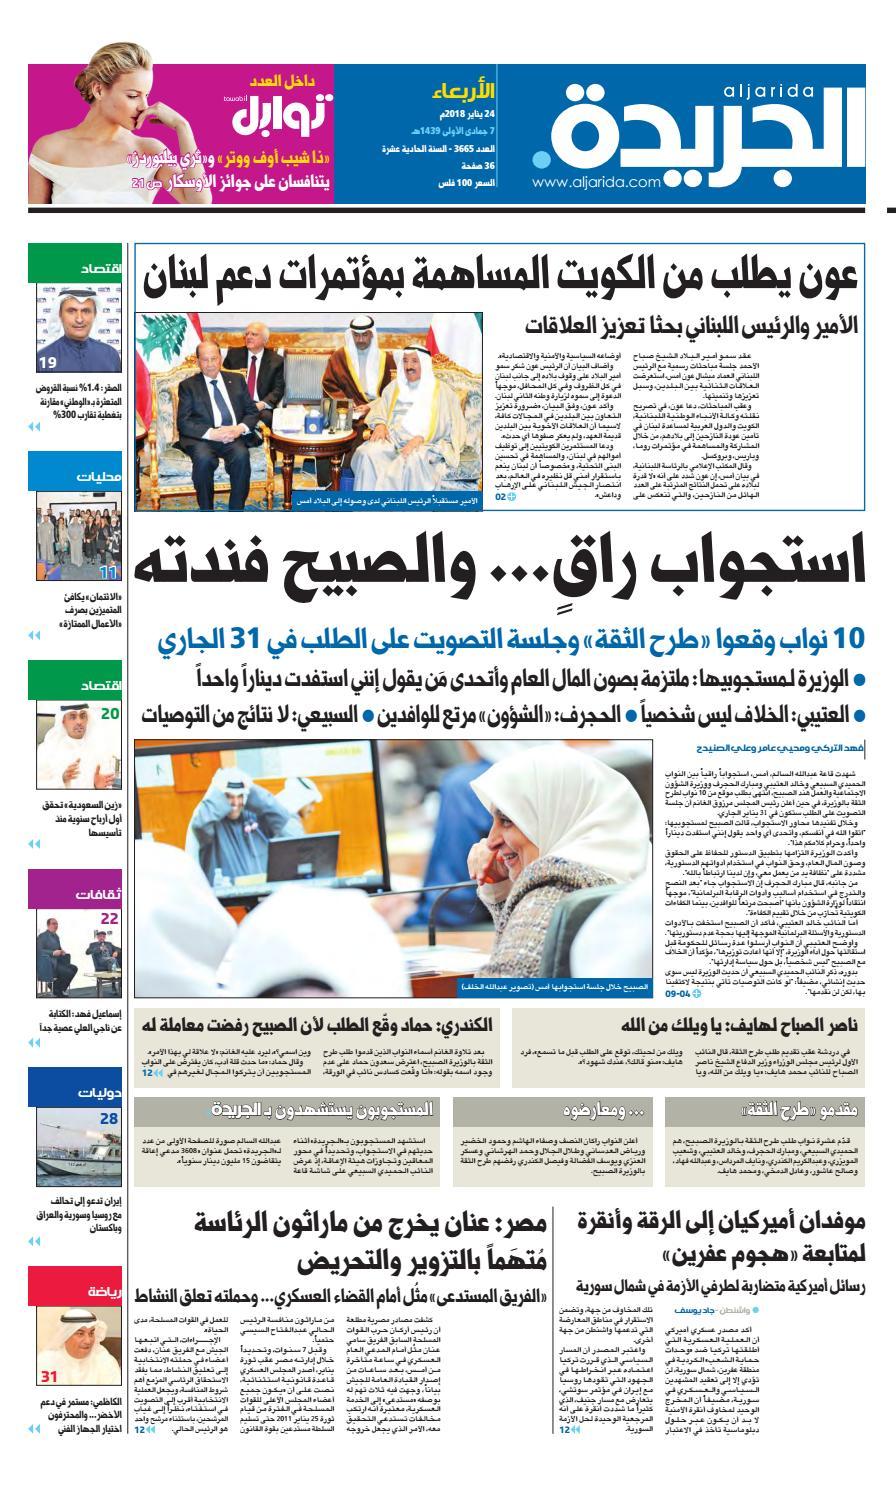 b44b0c0b4 عدد الجريدة الأربعاء 24 يناير 2018 by Aljarida Newspaper - issuu